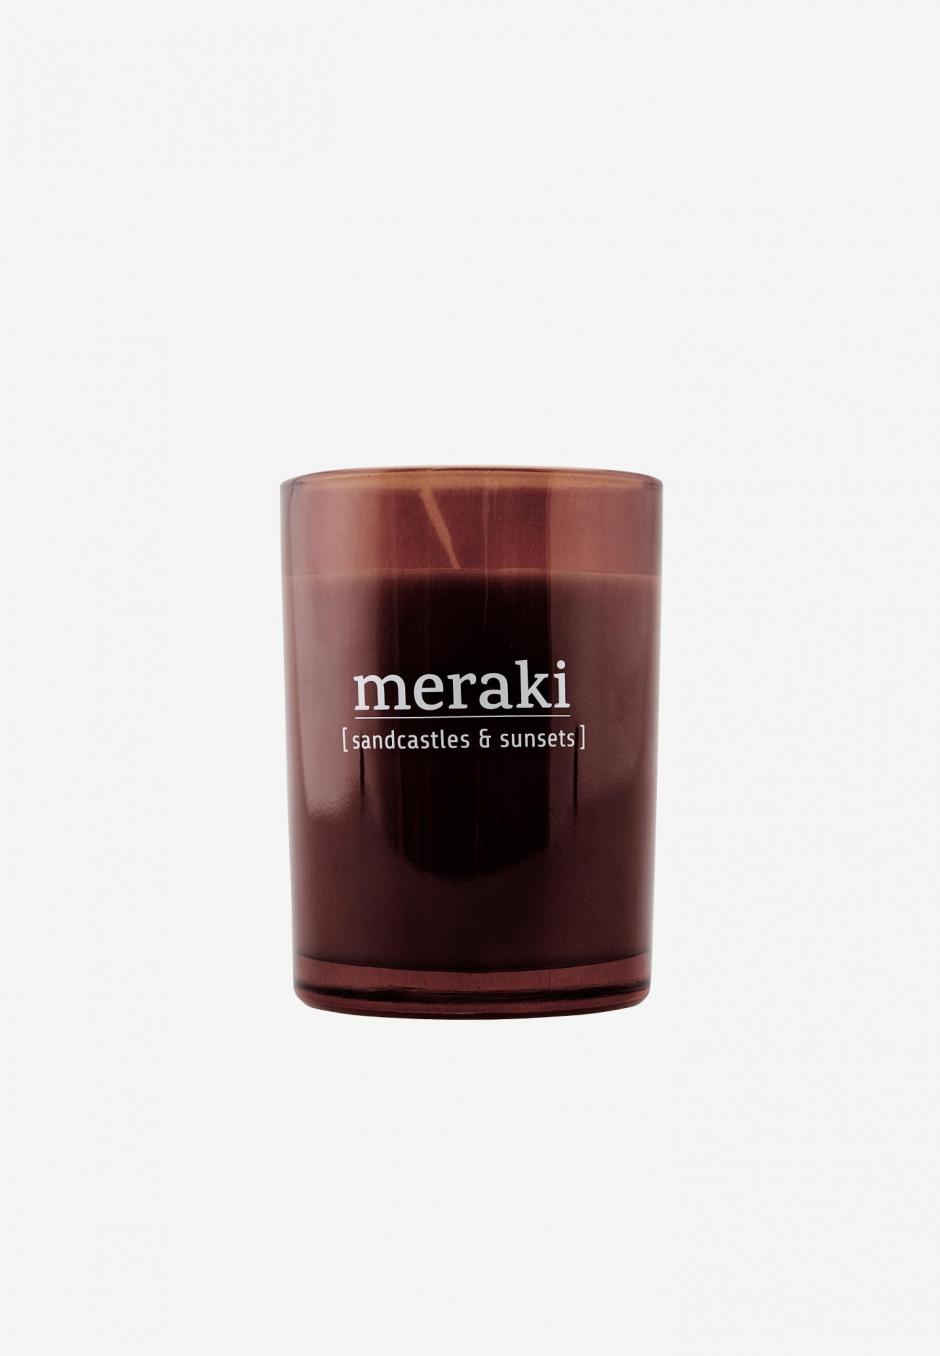 Meraki Scented Candle Sandcastles & Sunsets